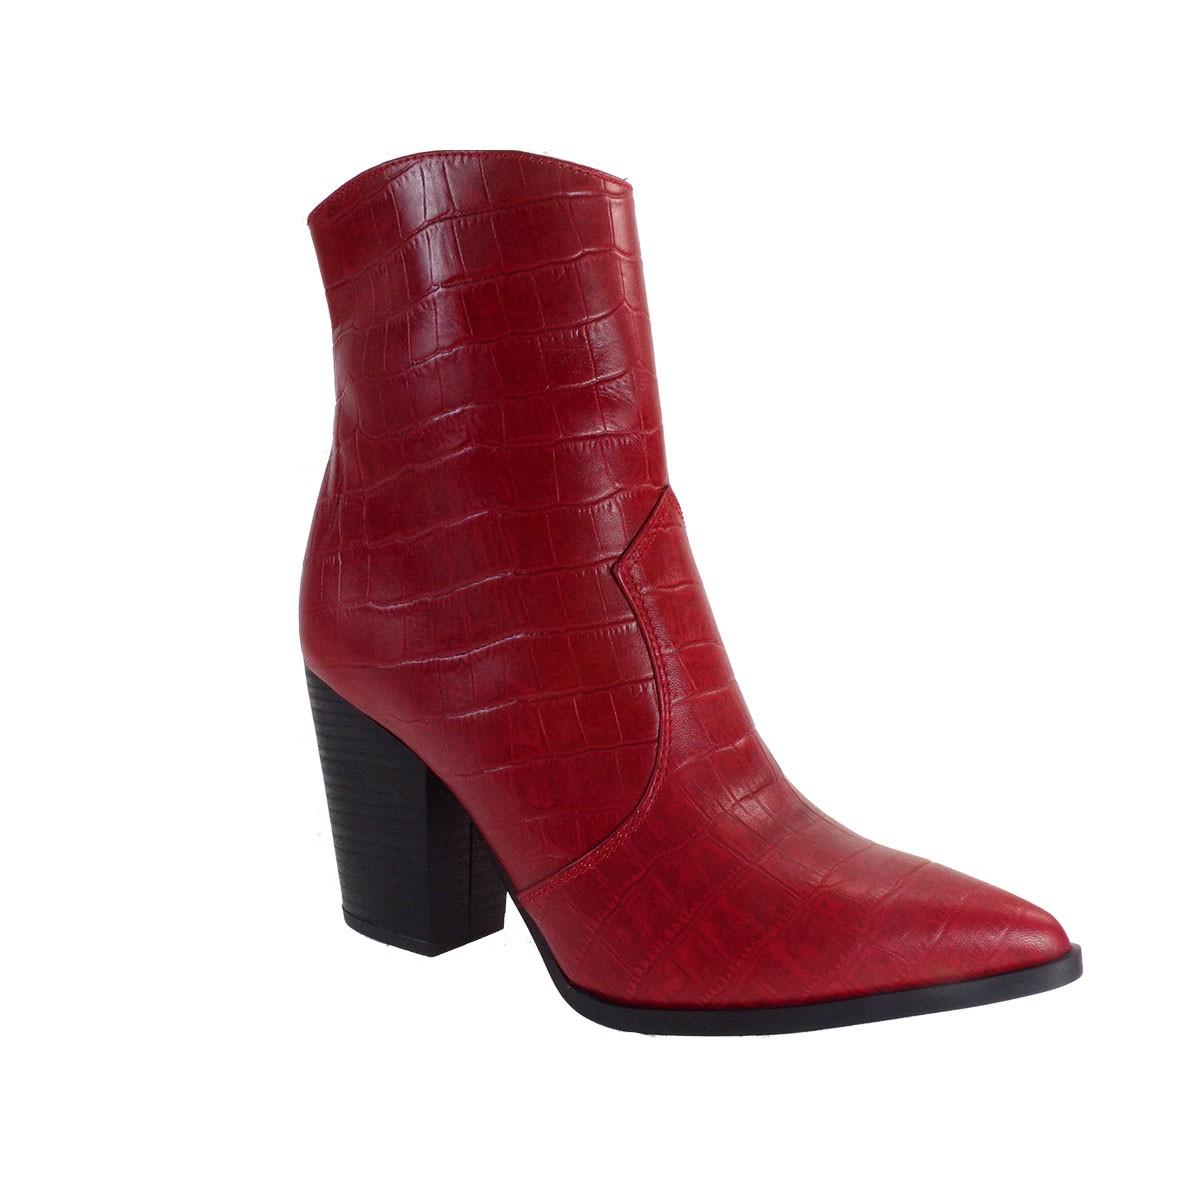 Fardoulis Shoes Γυναικεία Μποτάκια COW BOY Κ-316 Κόκκινο Δέρμα Κορκό